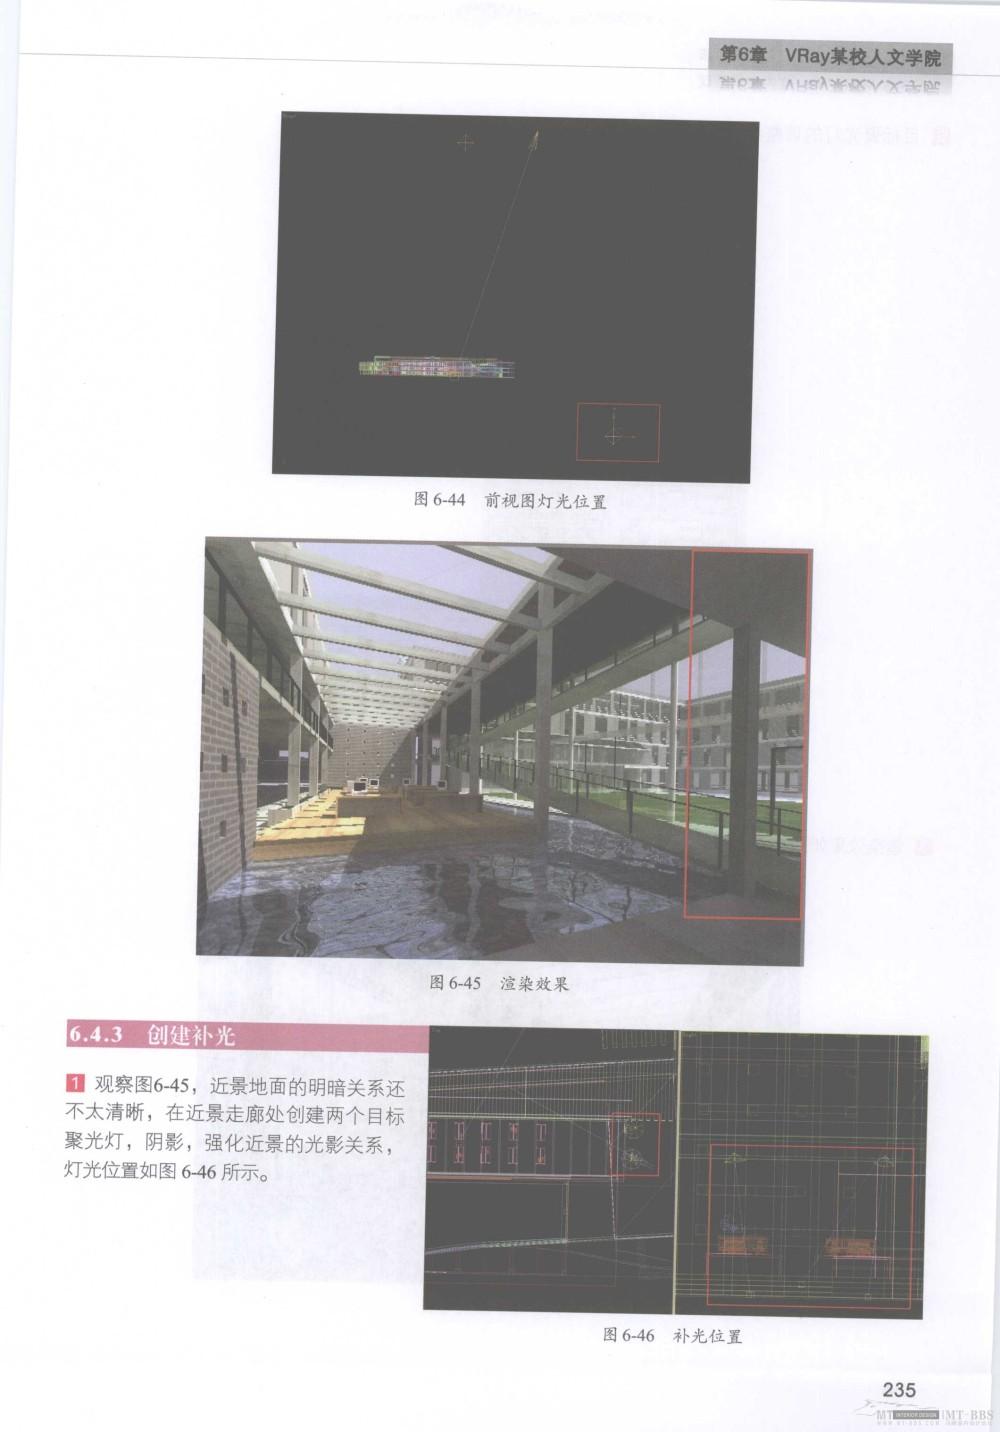 水晶石技法-3ds_Max&VRay室内空间表现_水晶石技法-3ds_Max&VRay室内空间表现_页面_241.jpg